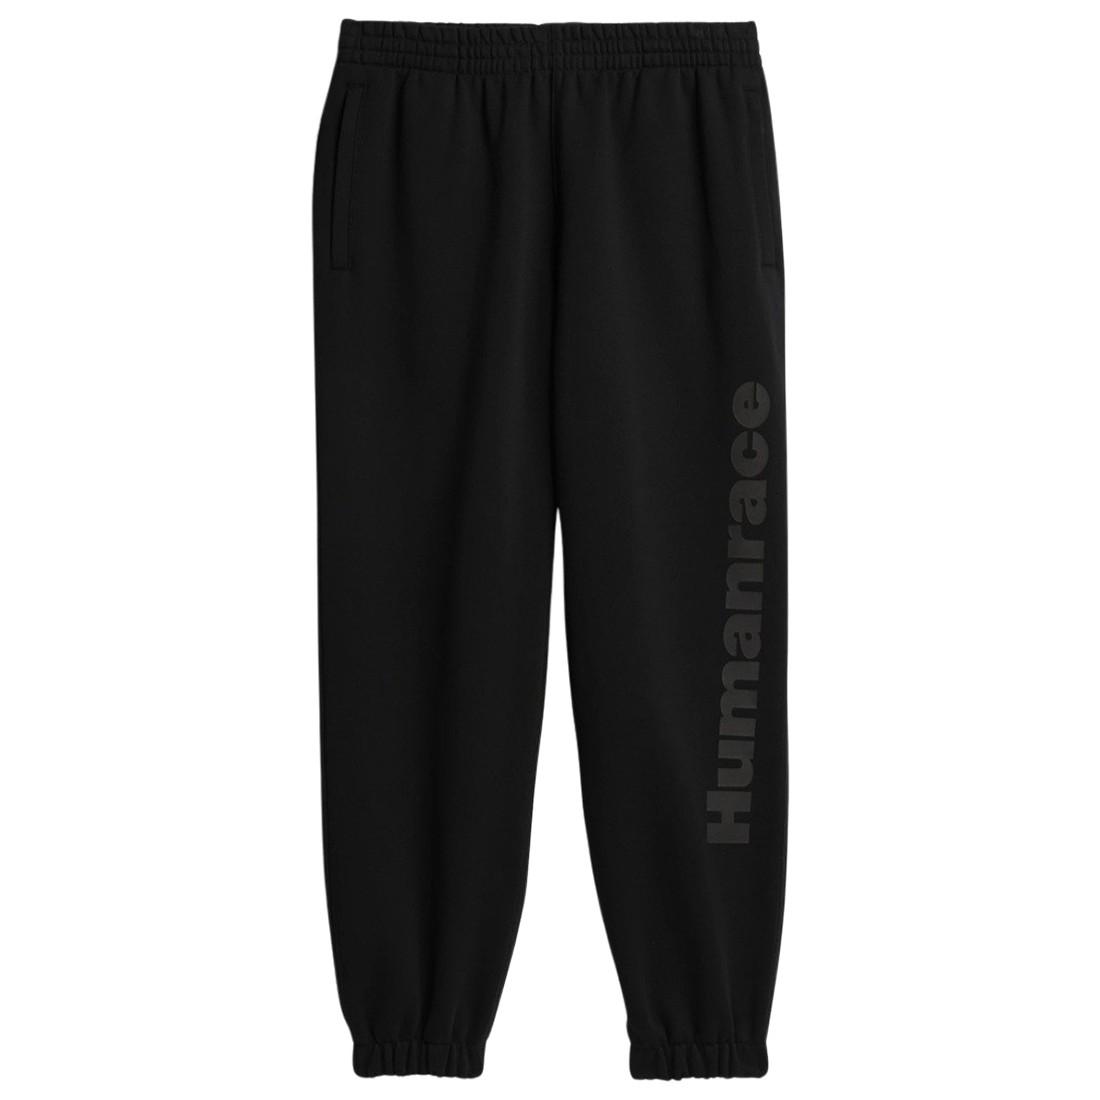 Adidas x Pharrell Williams Men Basics Pants (black)